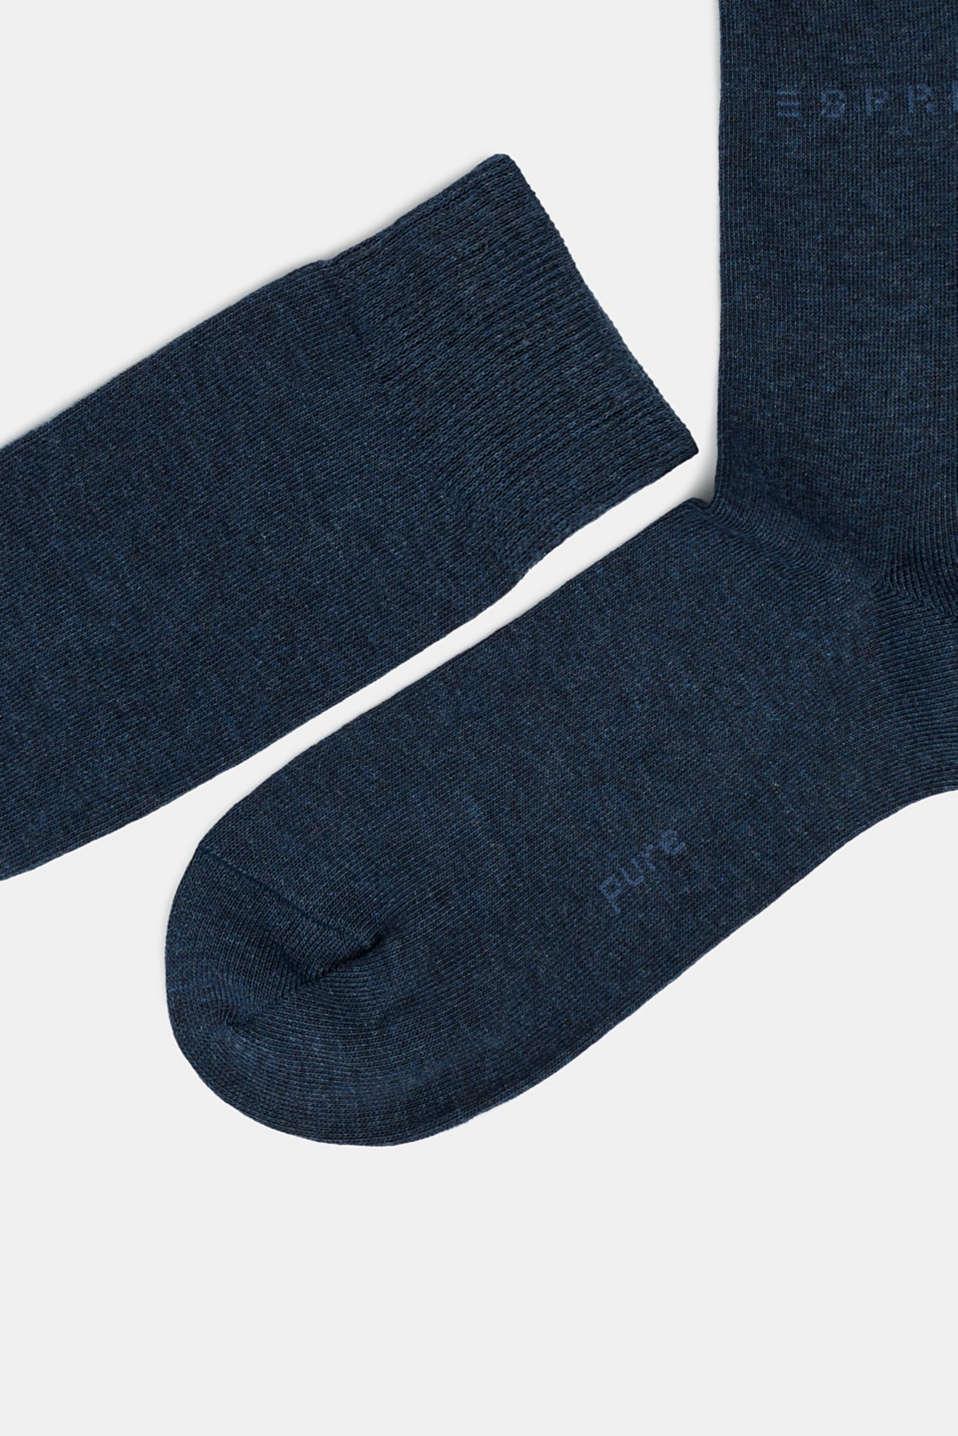 Knee-high socks made of blended cotton, NAVYBLUE M, detail image number 1